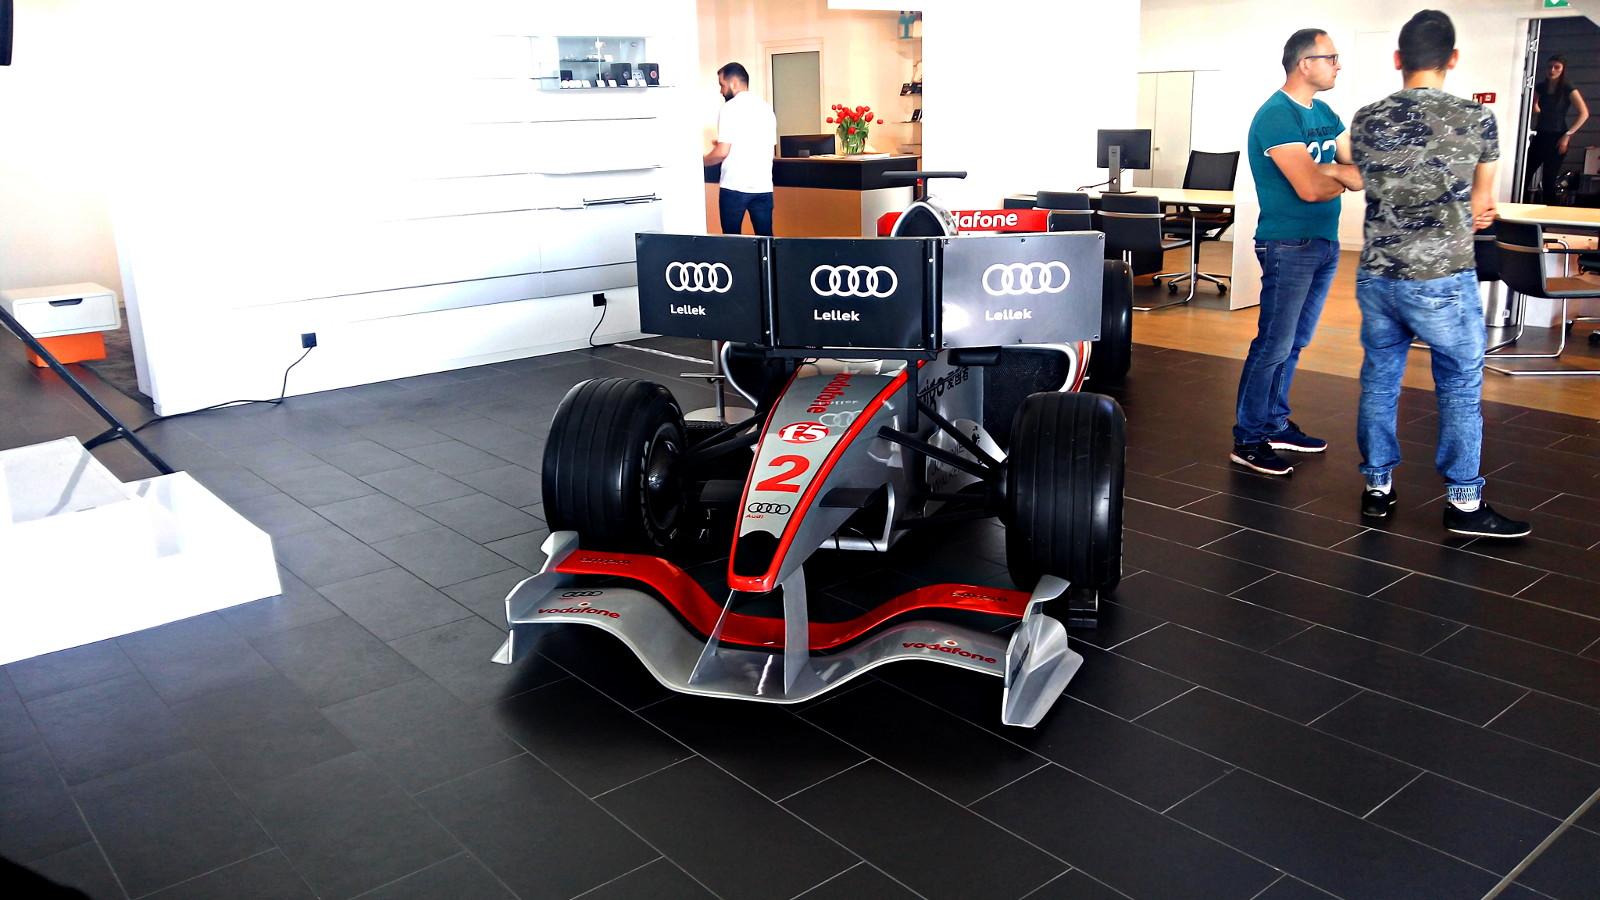 bolid F1 - symulator f1 na wynajem